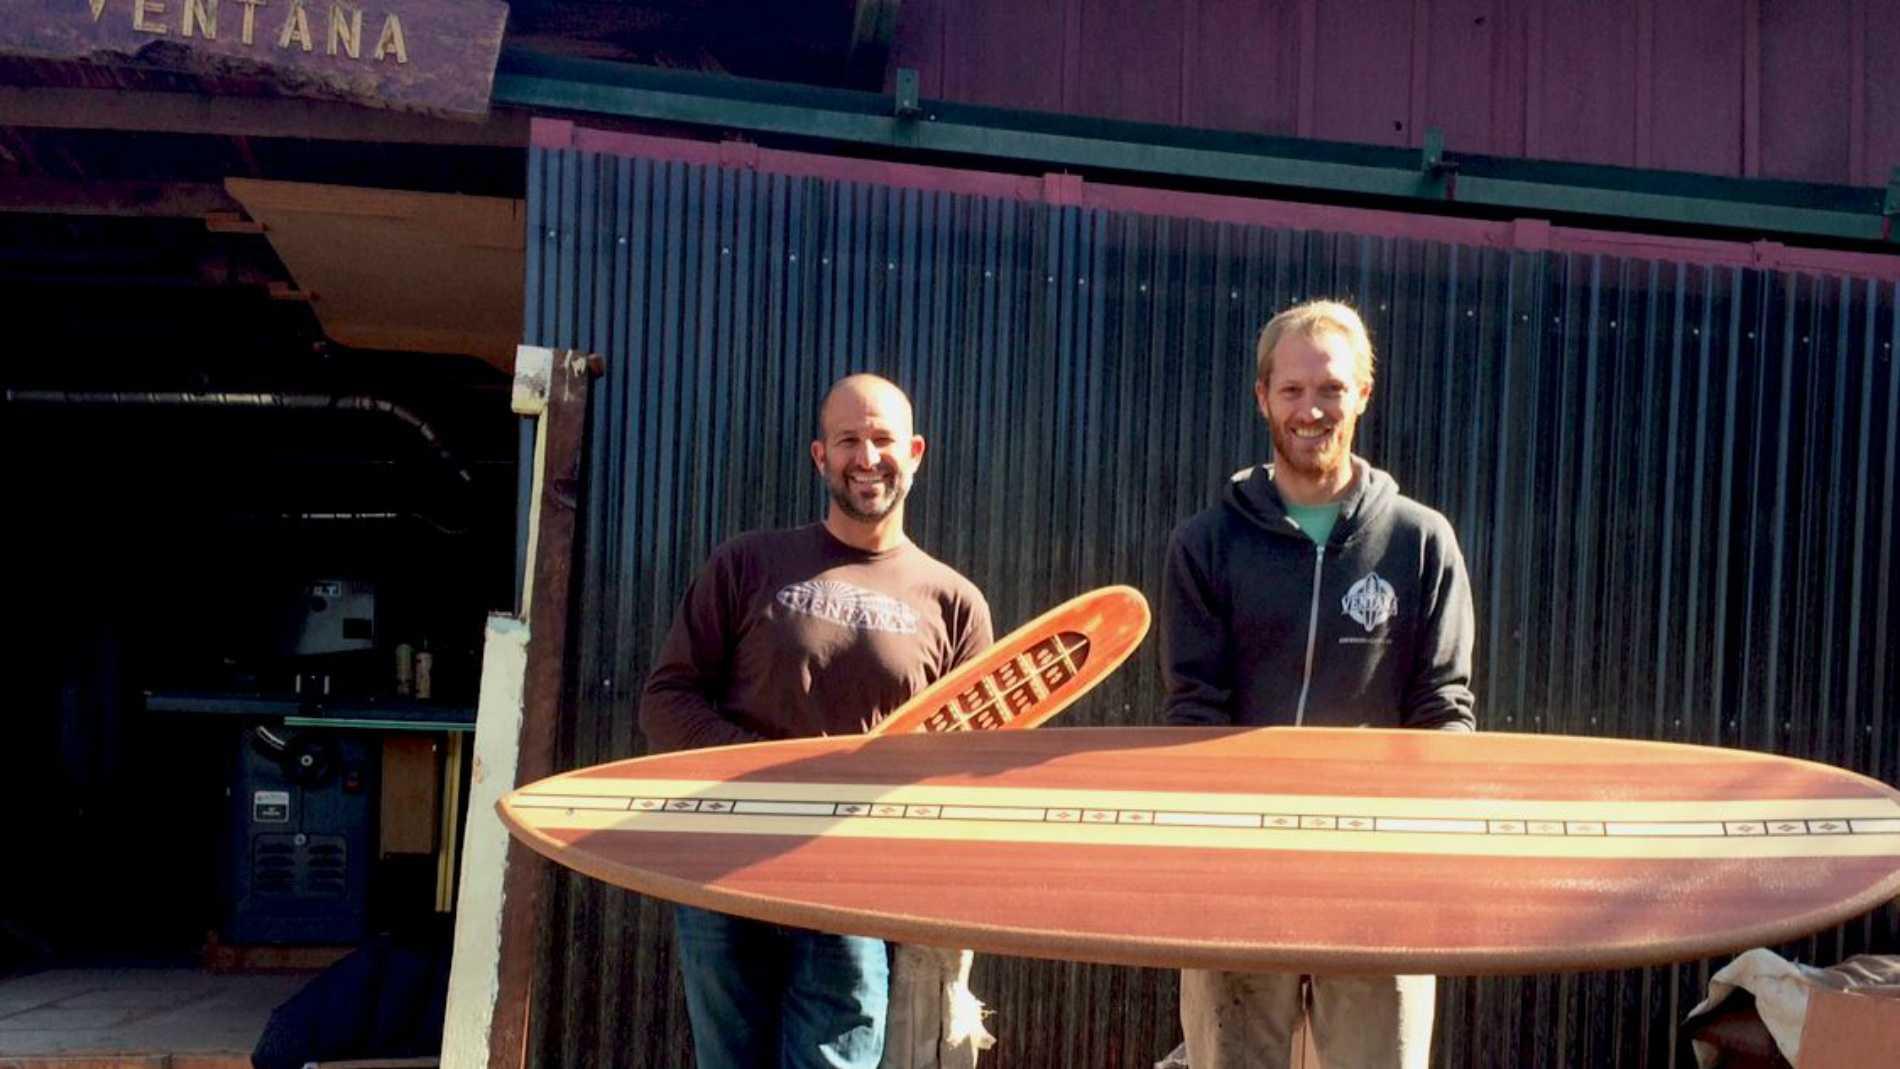 Ventana Surfboards